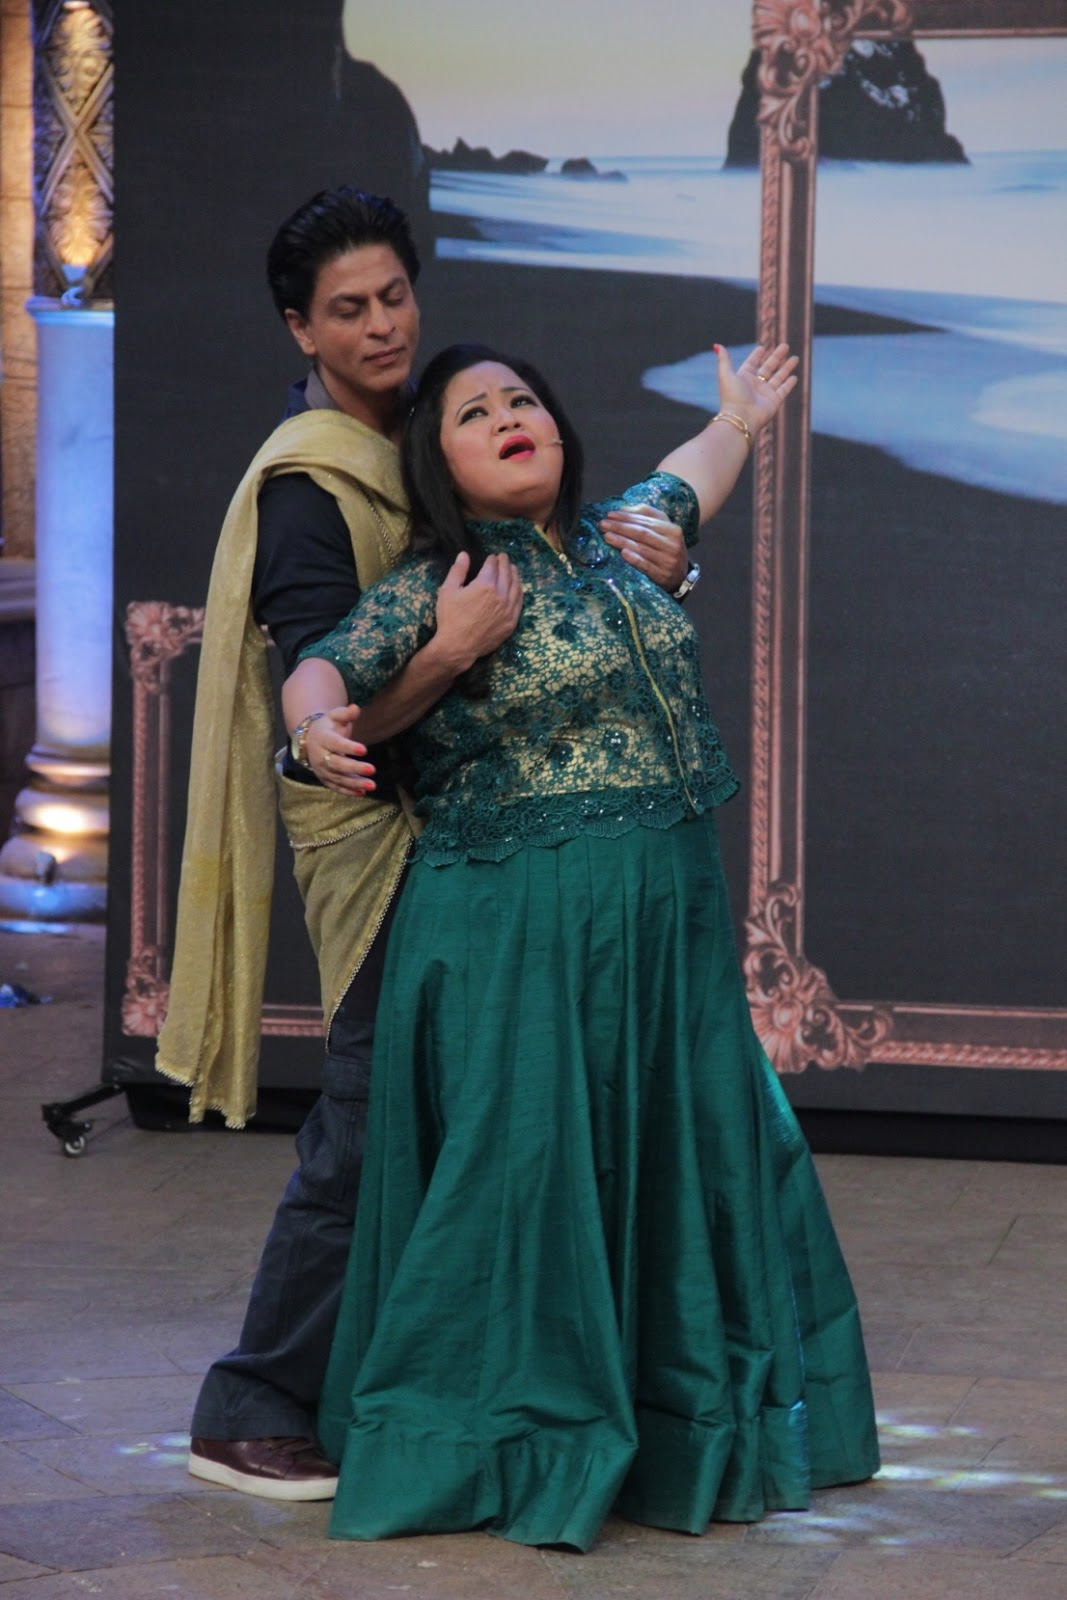 Shahrukh Khan on the set of Comedy Nights Bachao-07